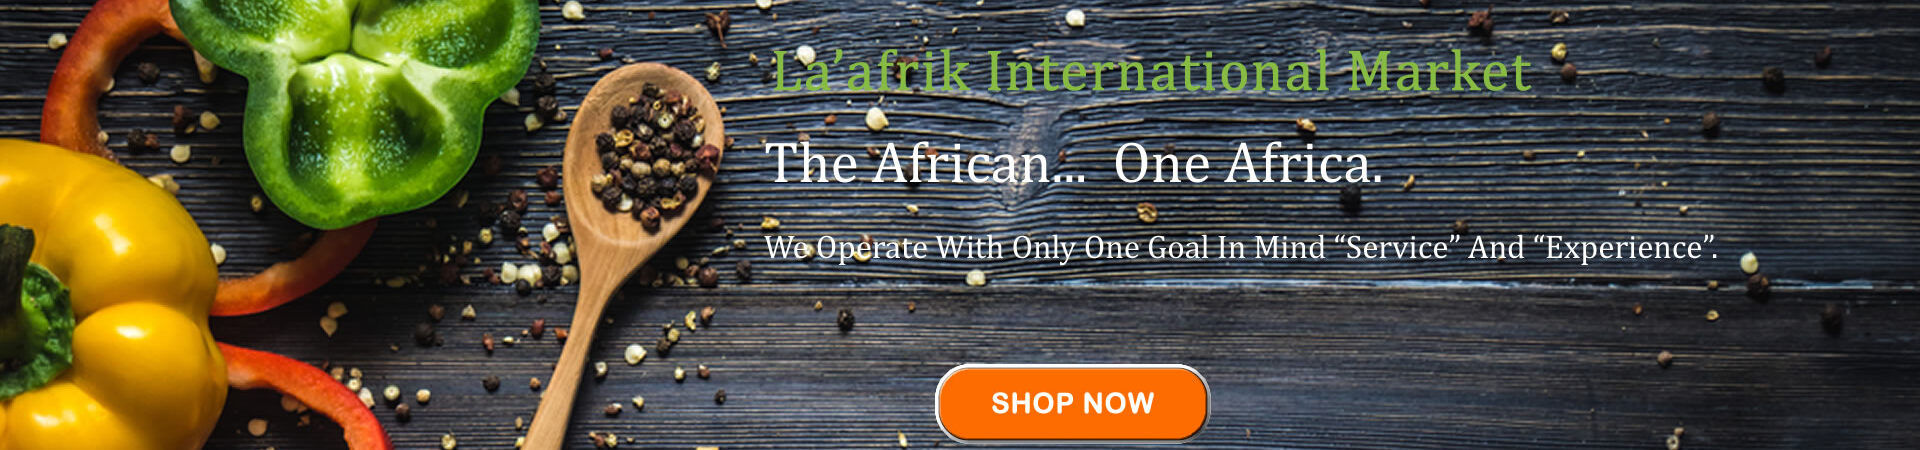 La'afrik International Market